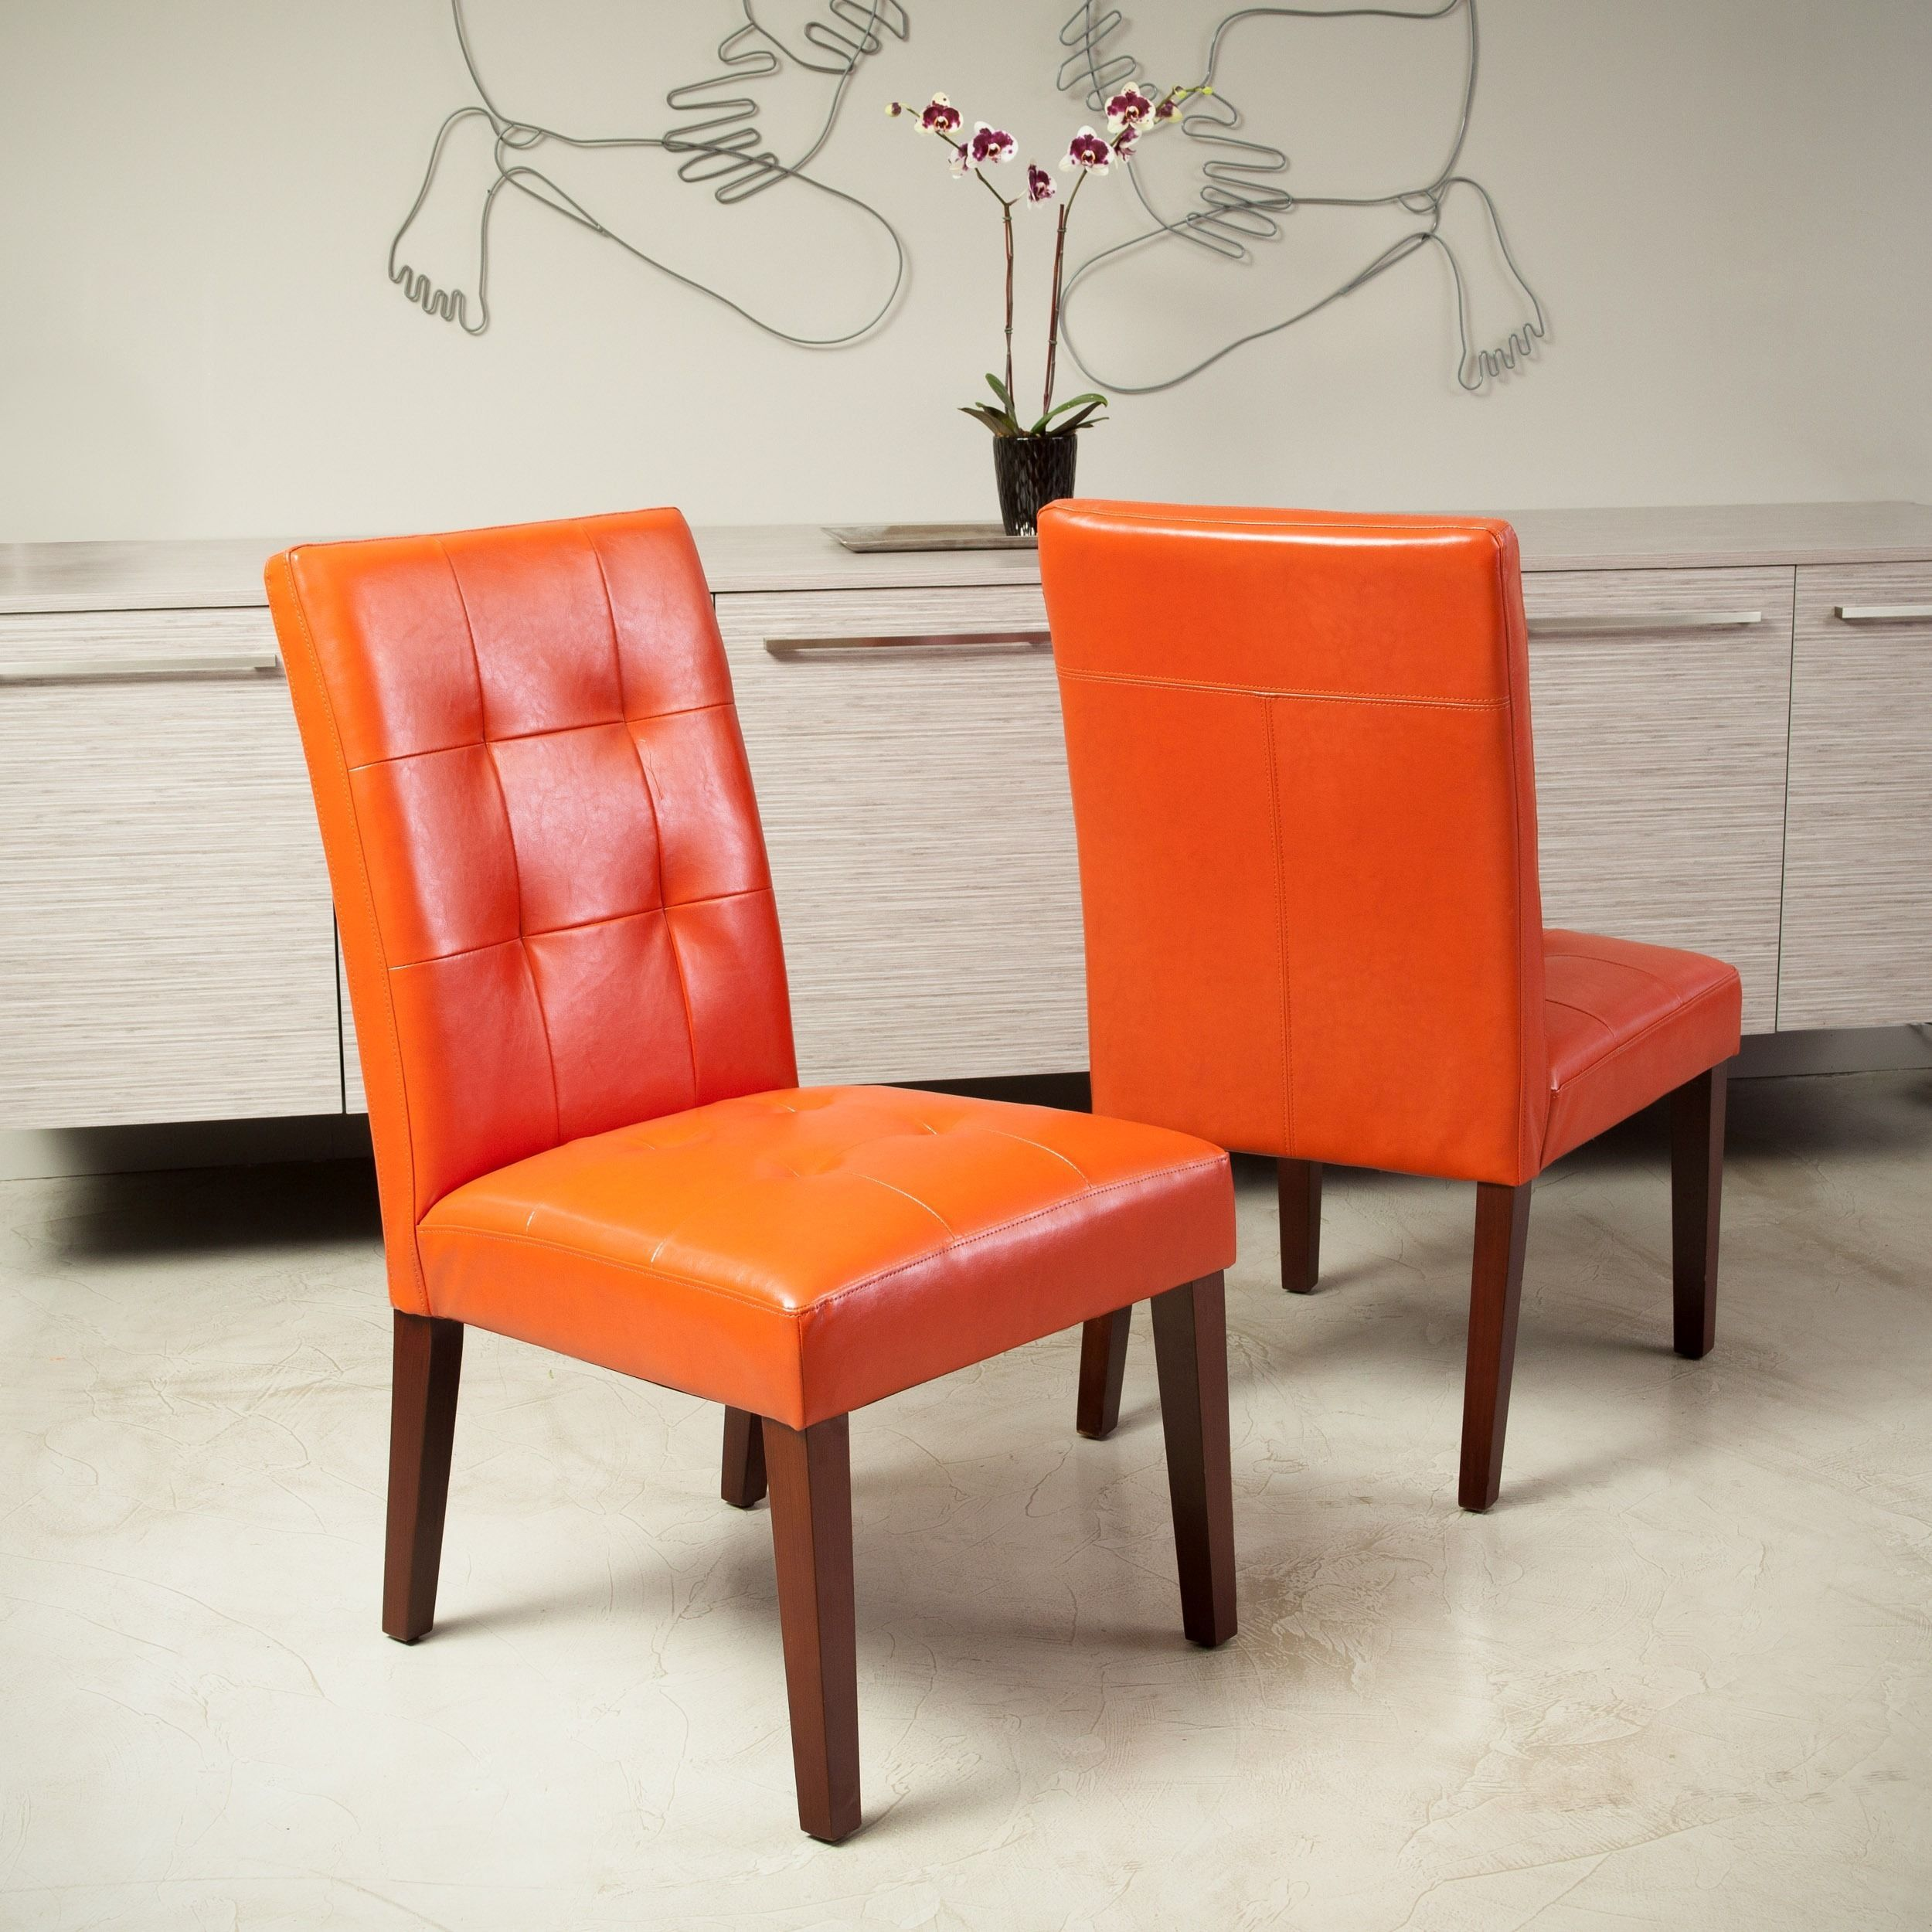 Cambridge tufted orange bonded leather dining chair set